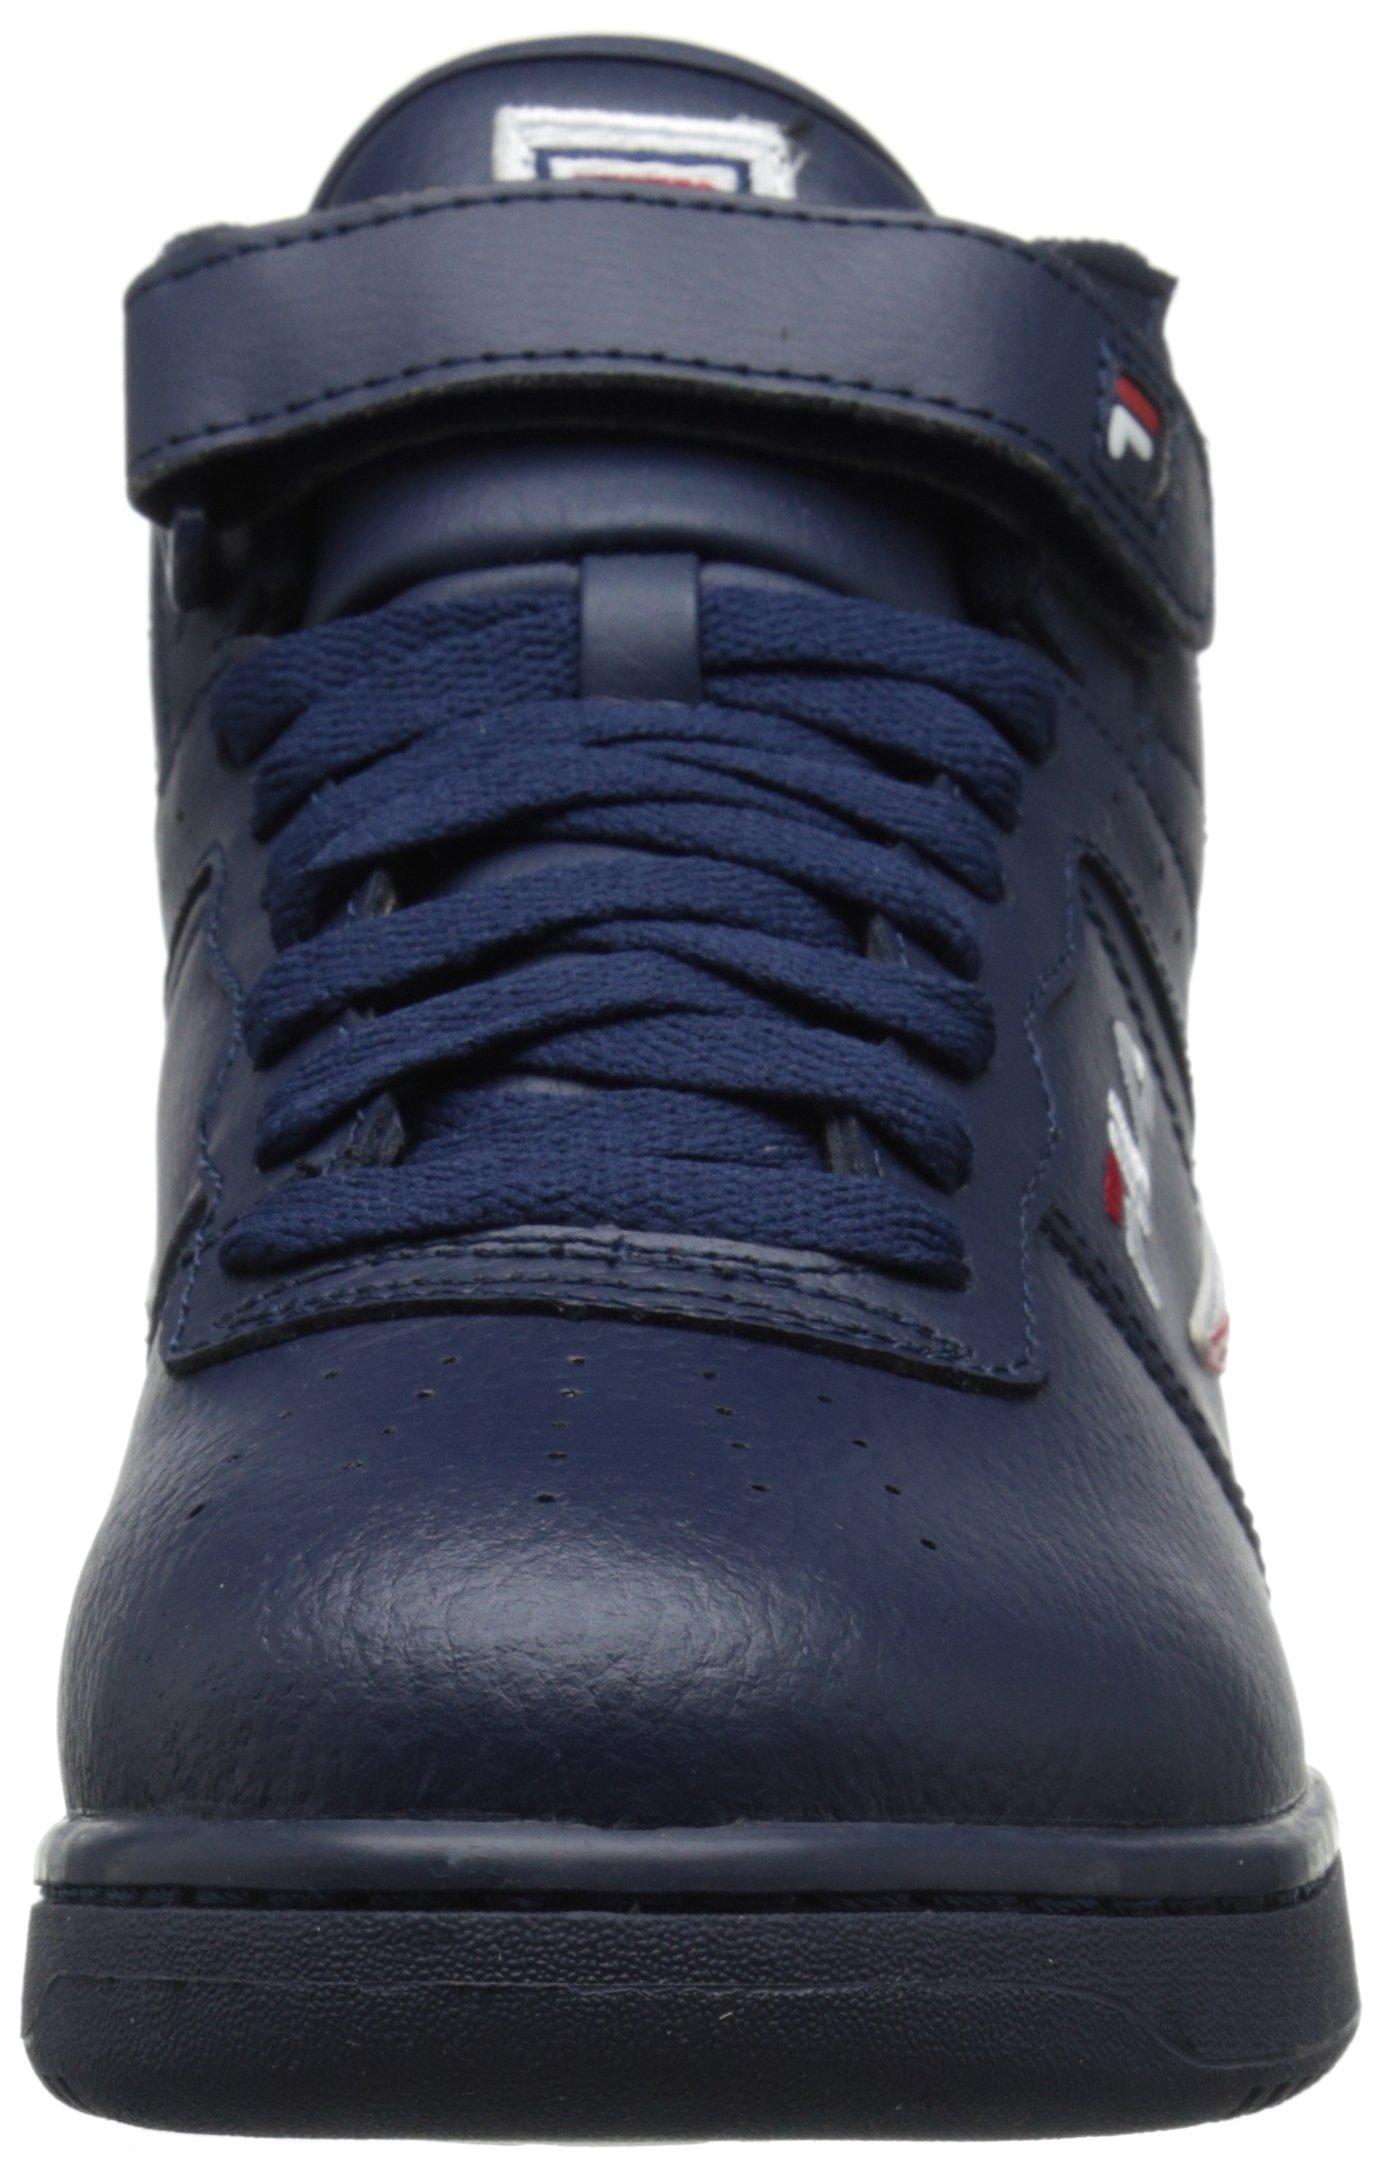 25bd1c0703b6 Fila Men s f-13v lea syn Fashion Sneaker